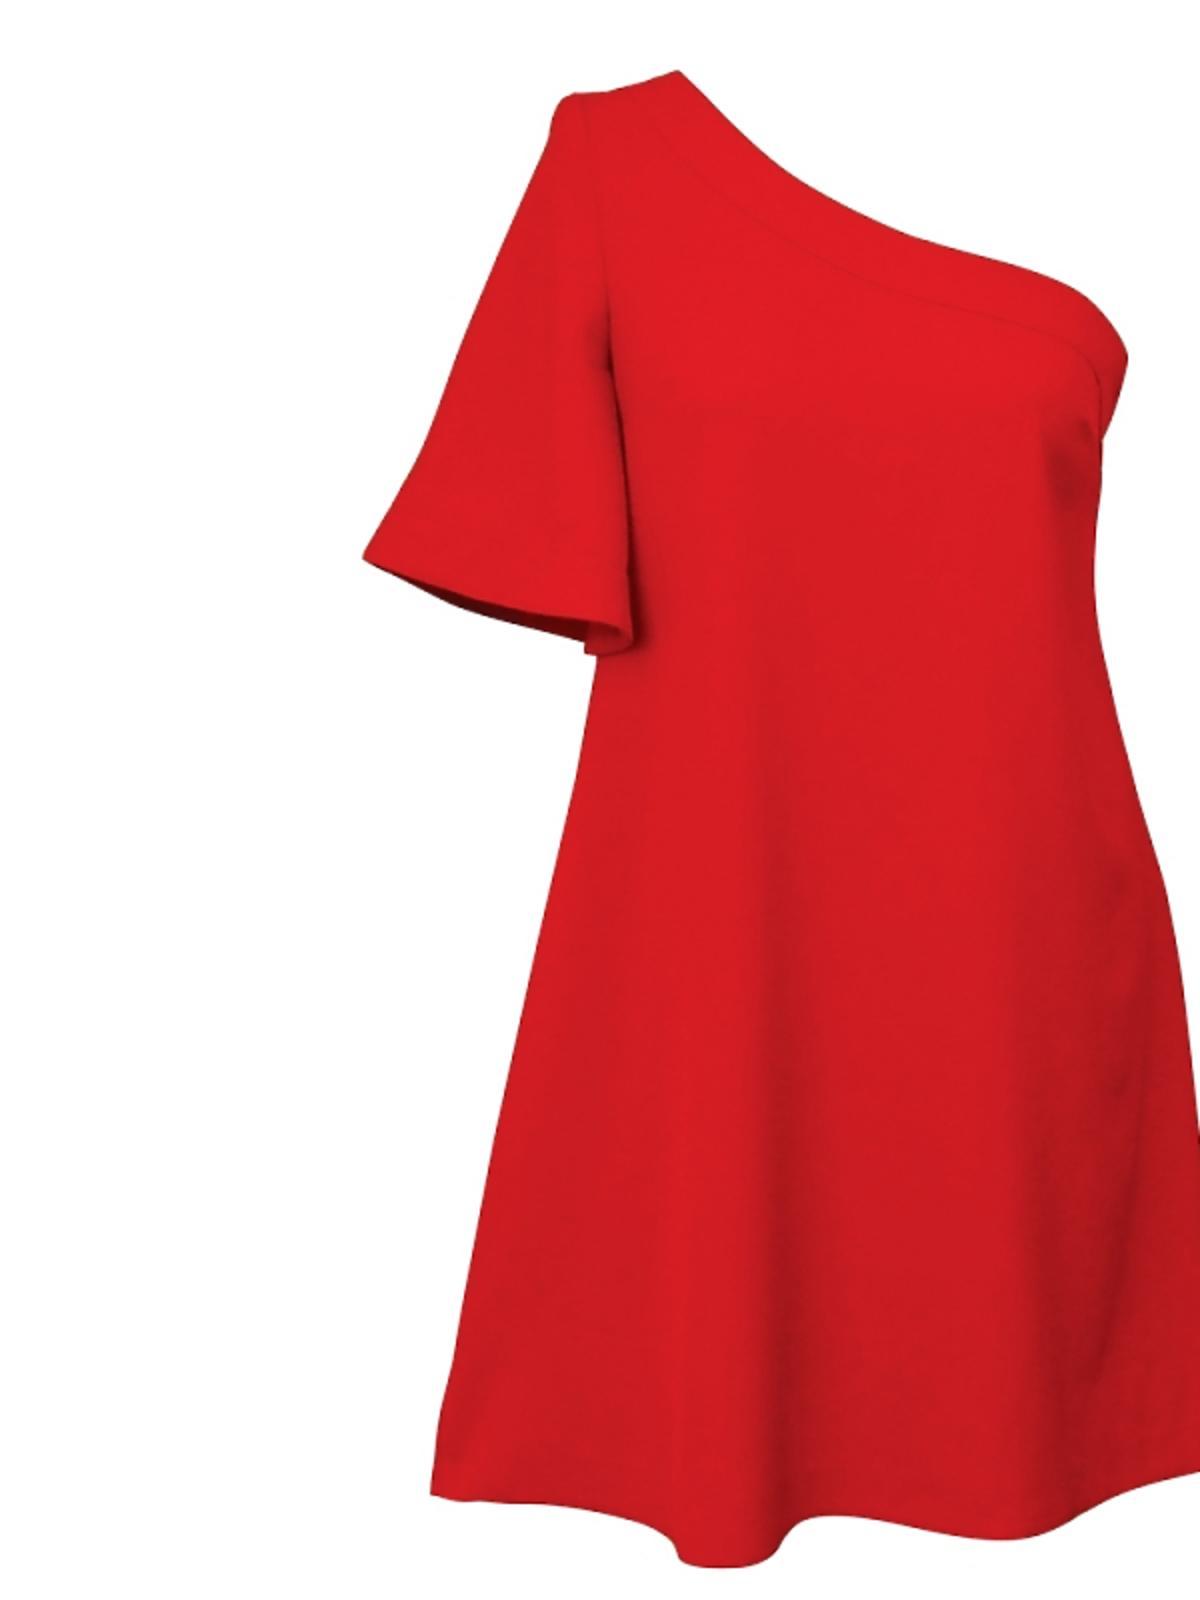 MOMO fashion / Pakamera.pl, 399 zł